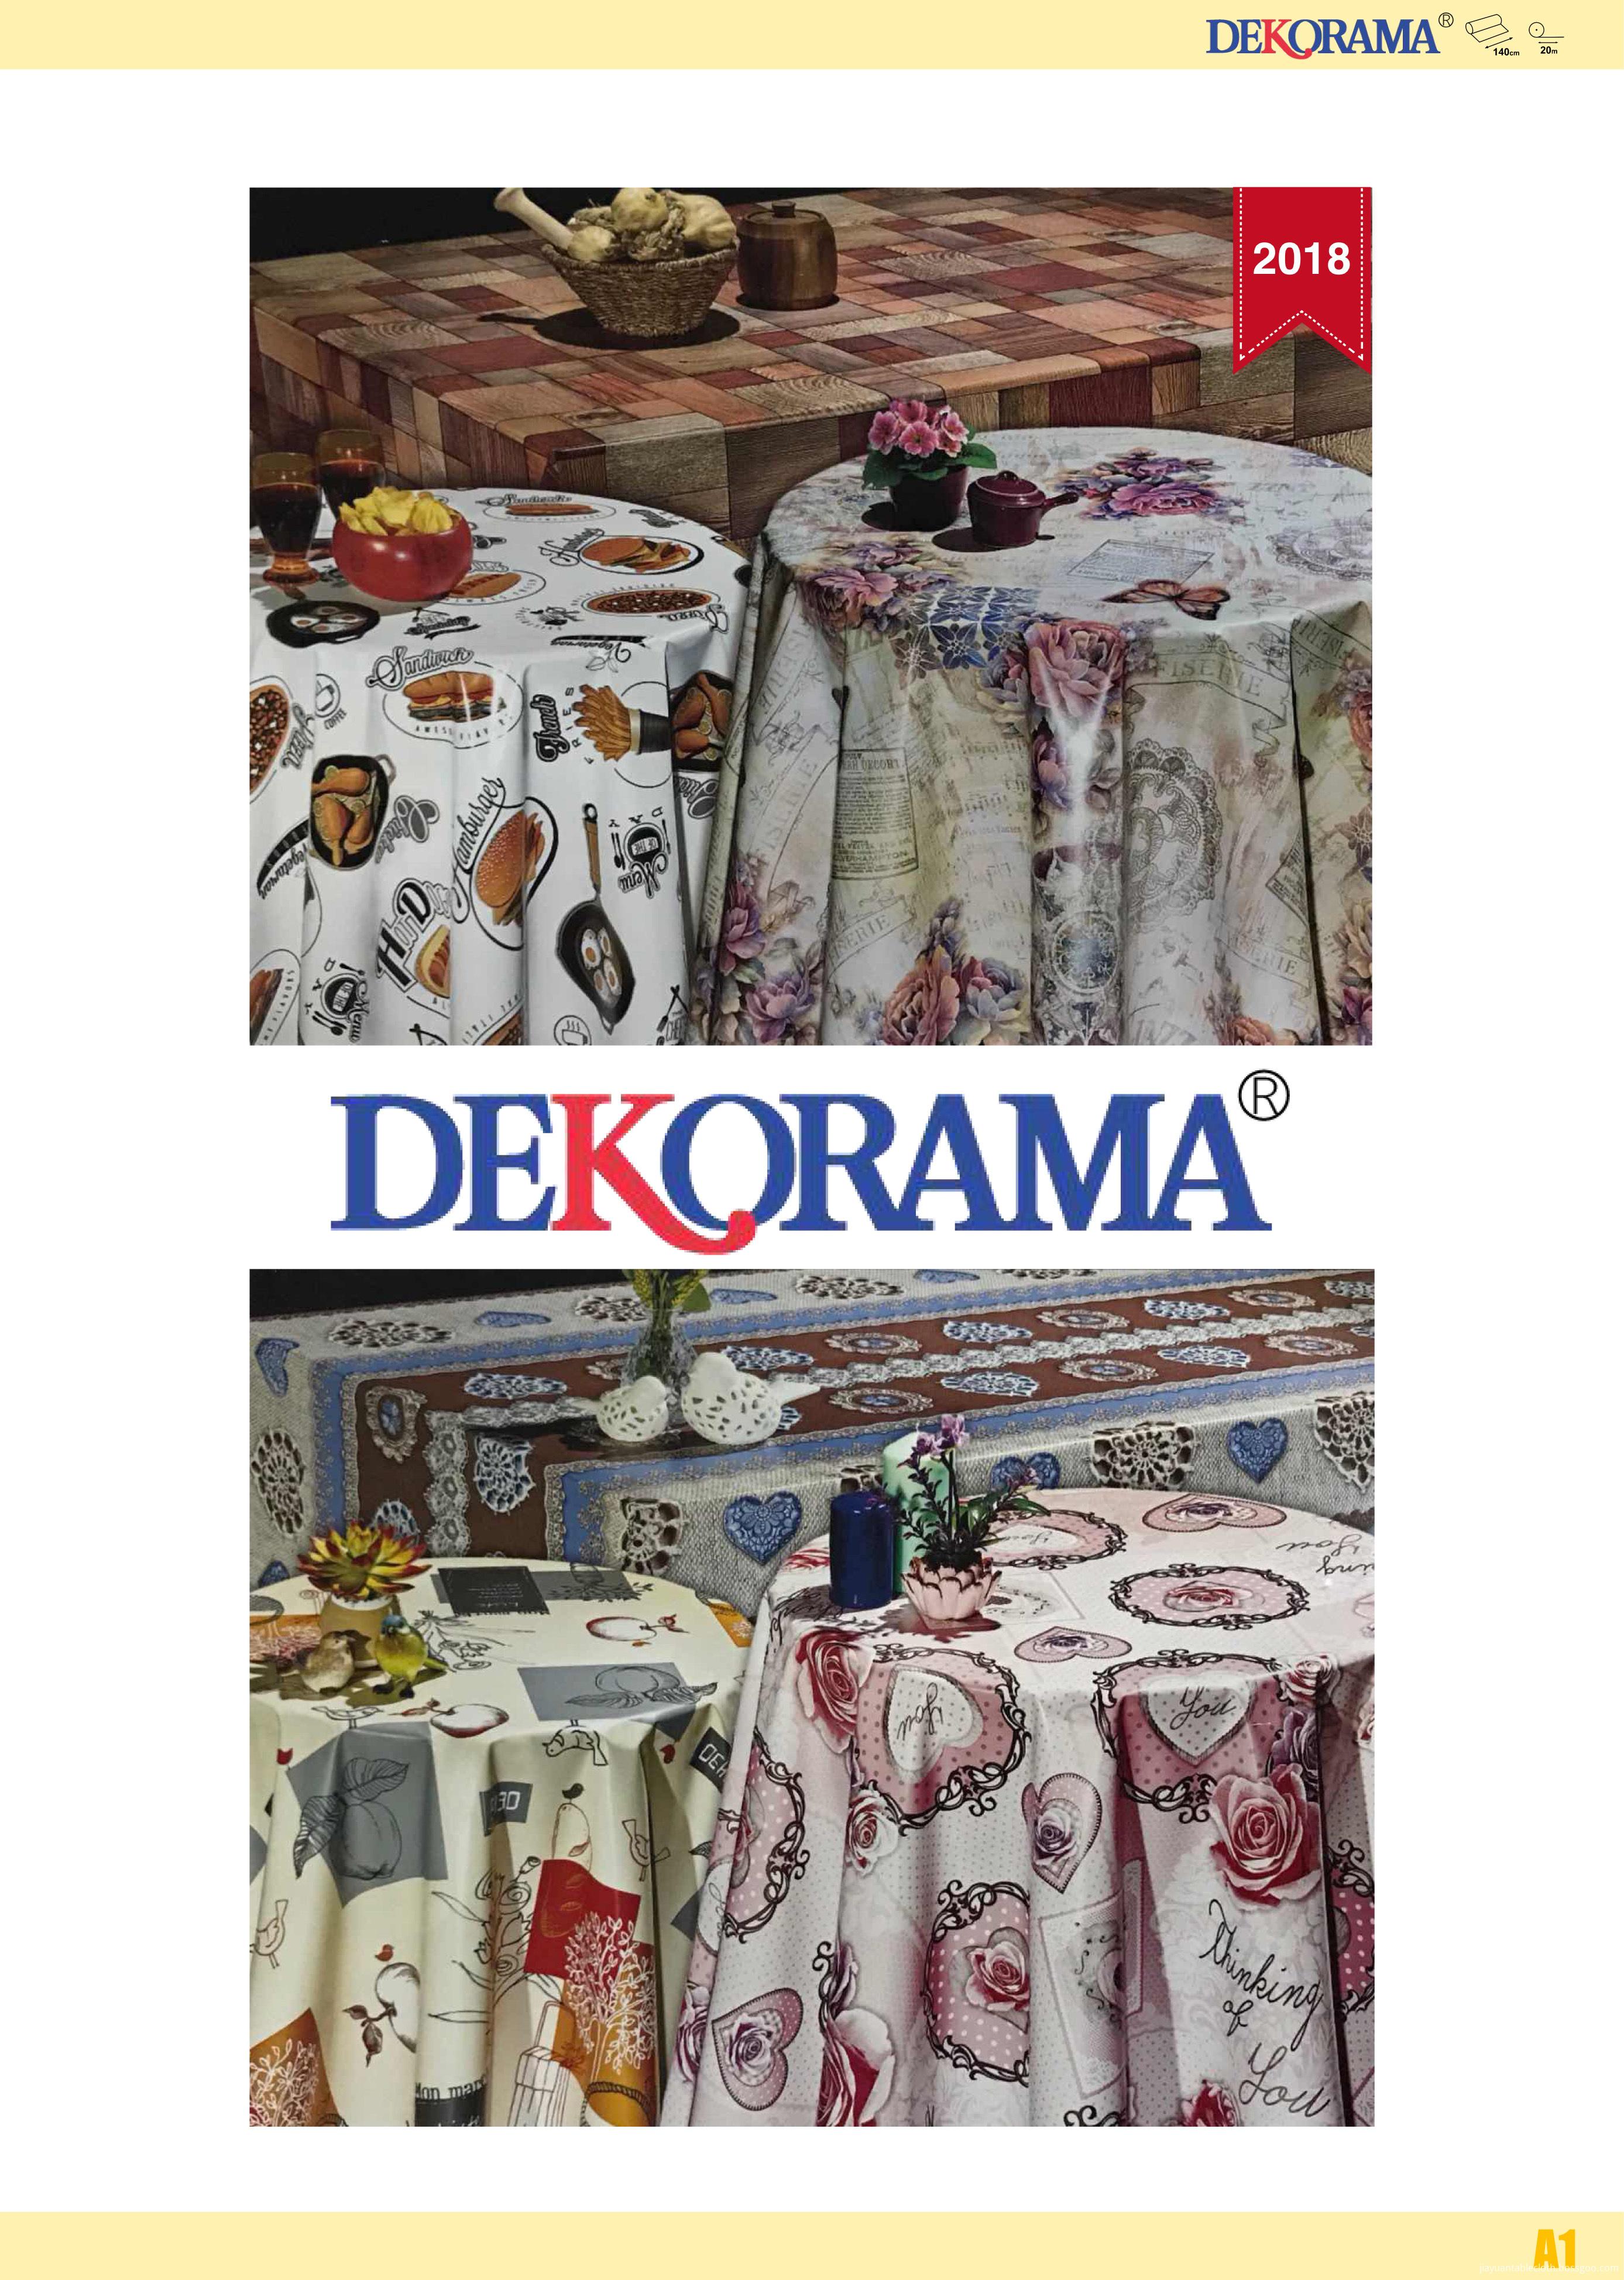 Dekorama Tablecloth